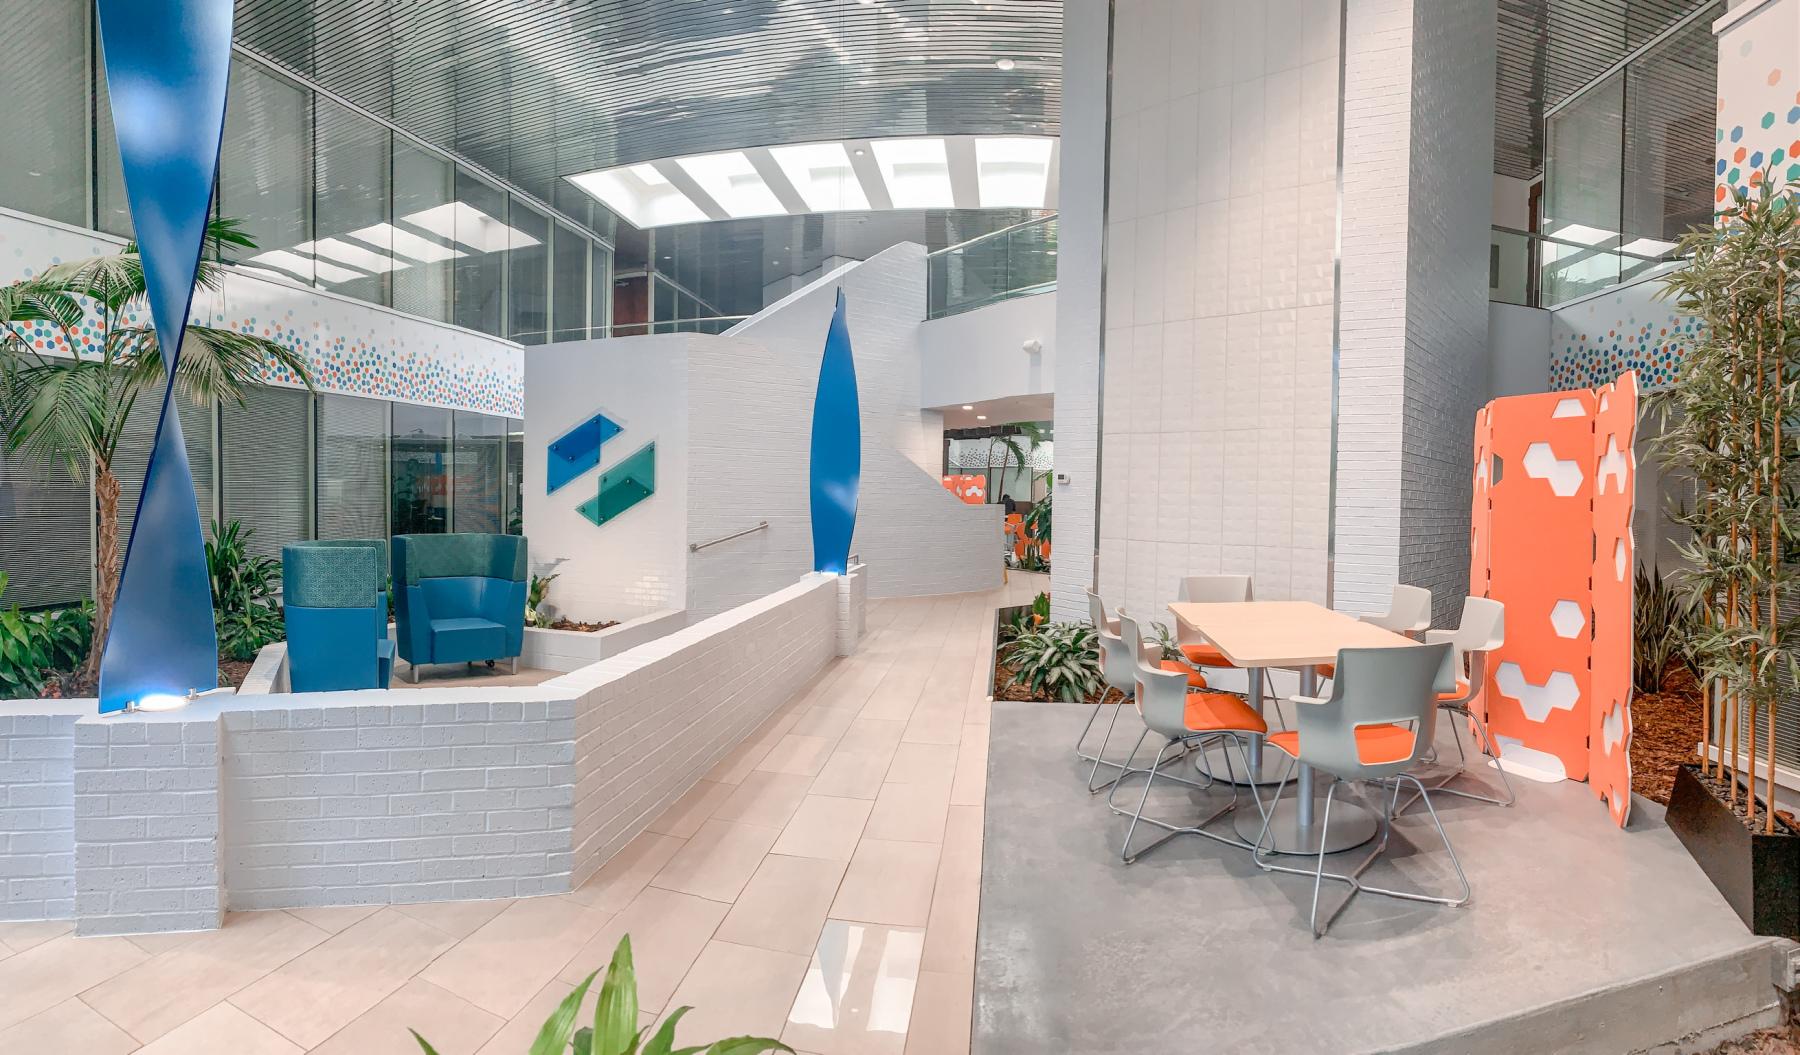 northdale_lobby-open-workspace-12